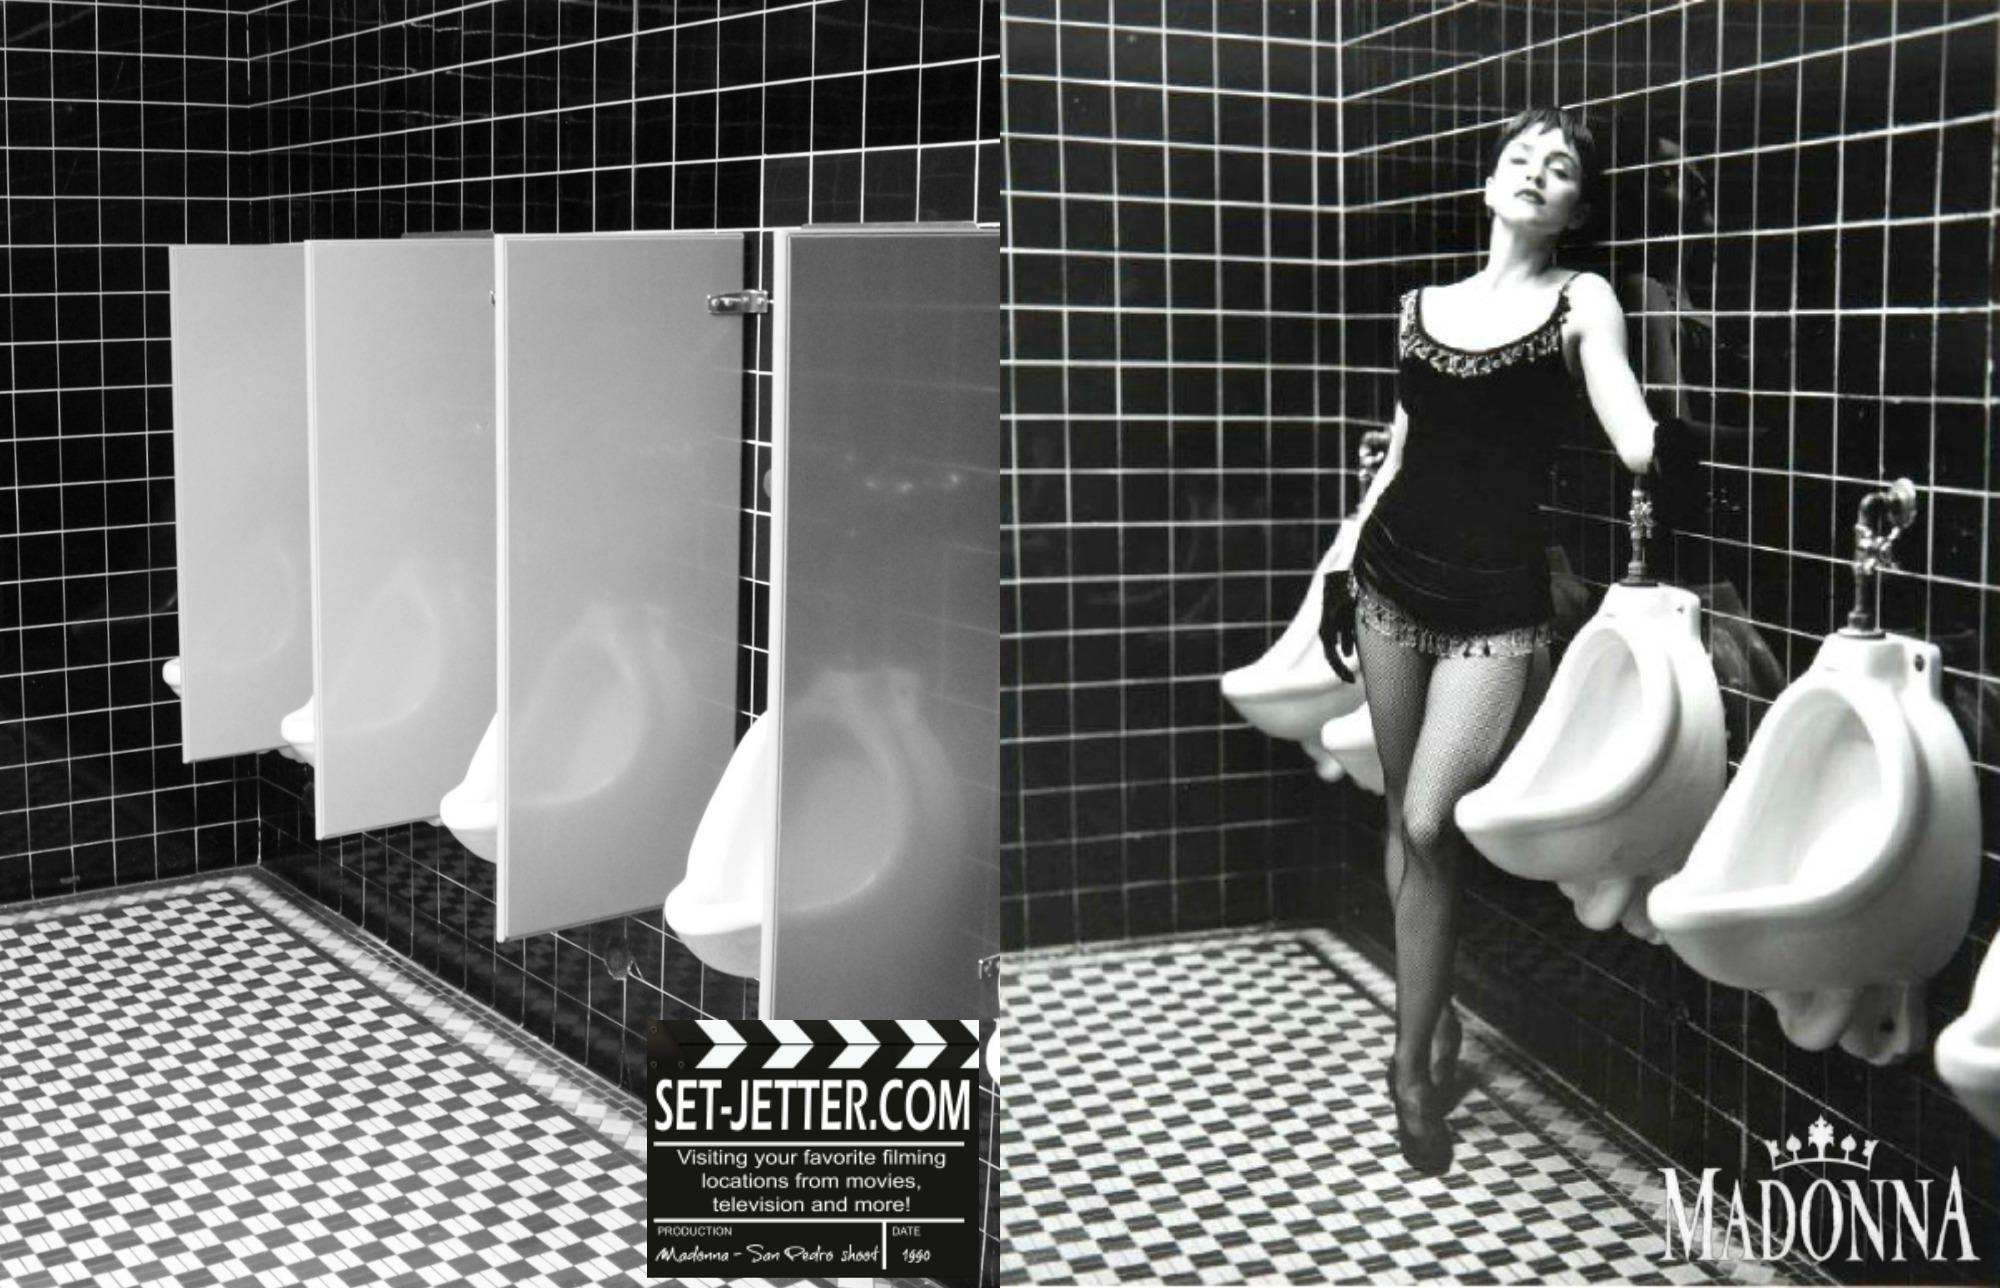 Madonna-HerbRitts-01A.jpg